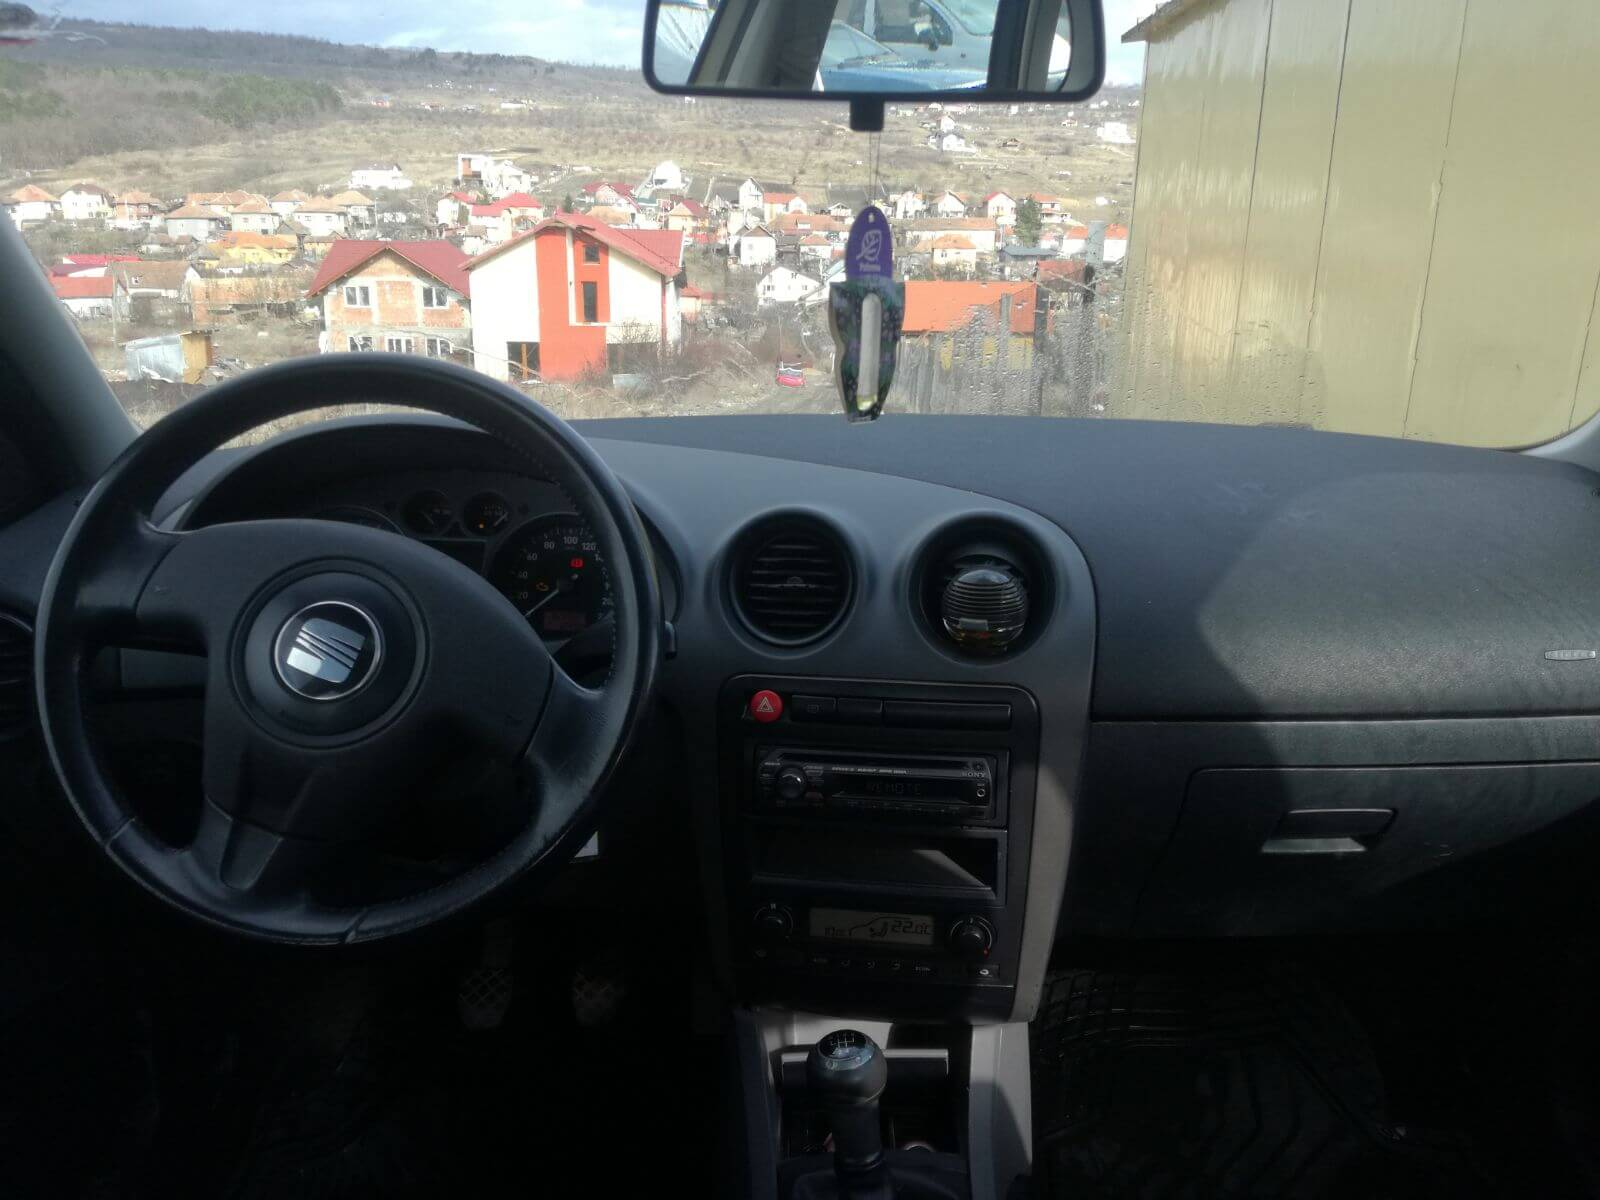 - inchirieri auto cluj